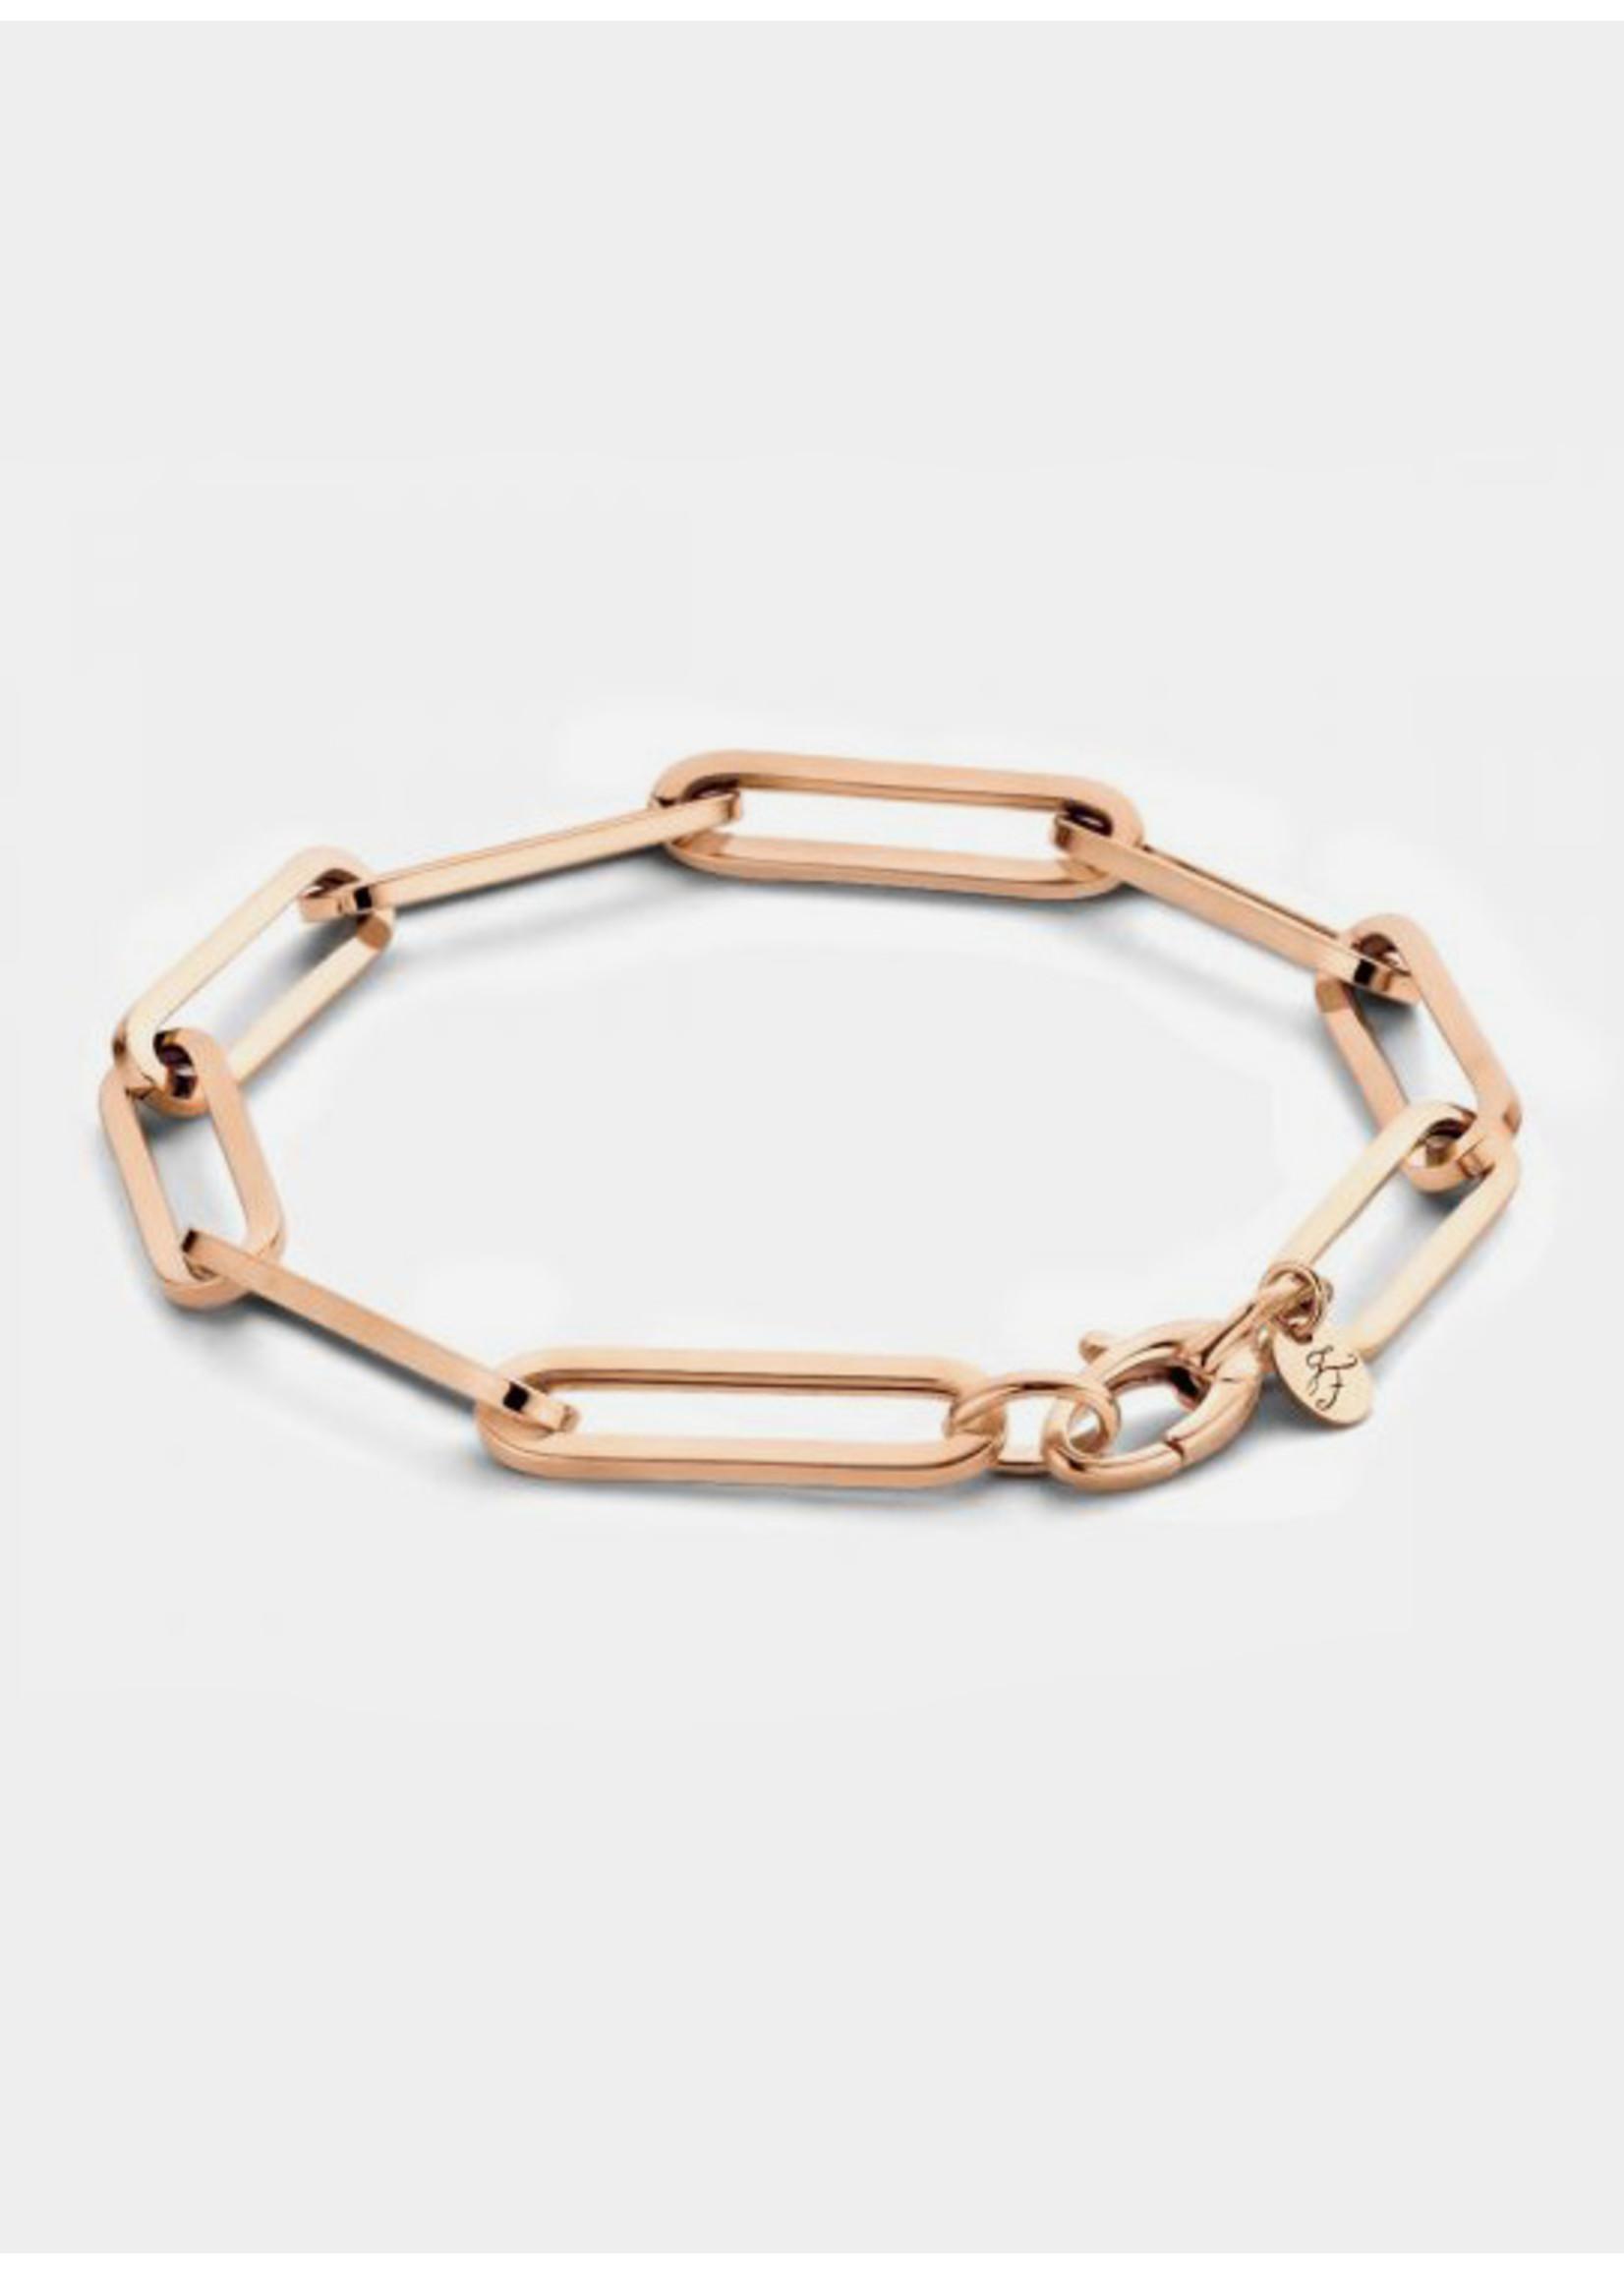 Just Franky Charm bracelet 19 cm